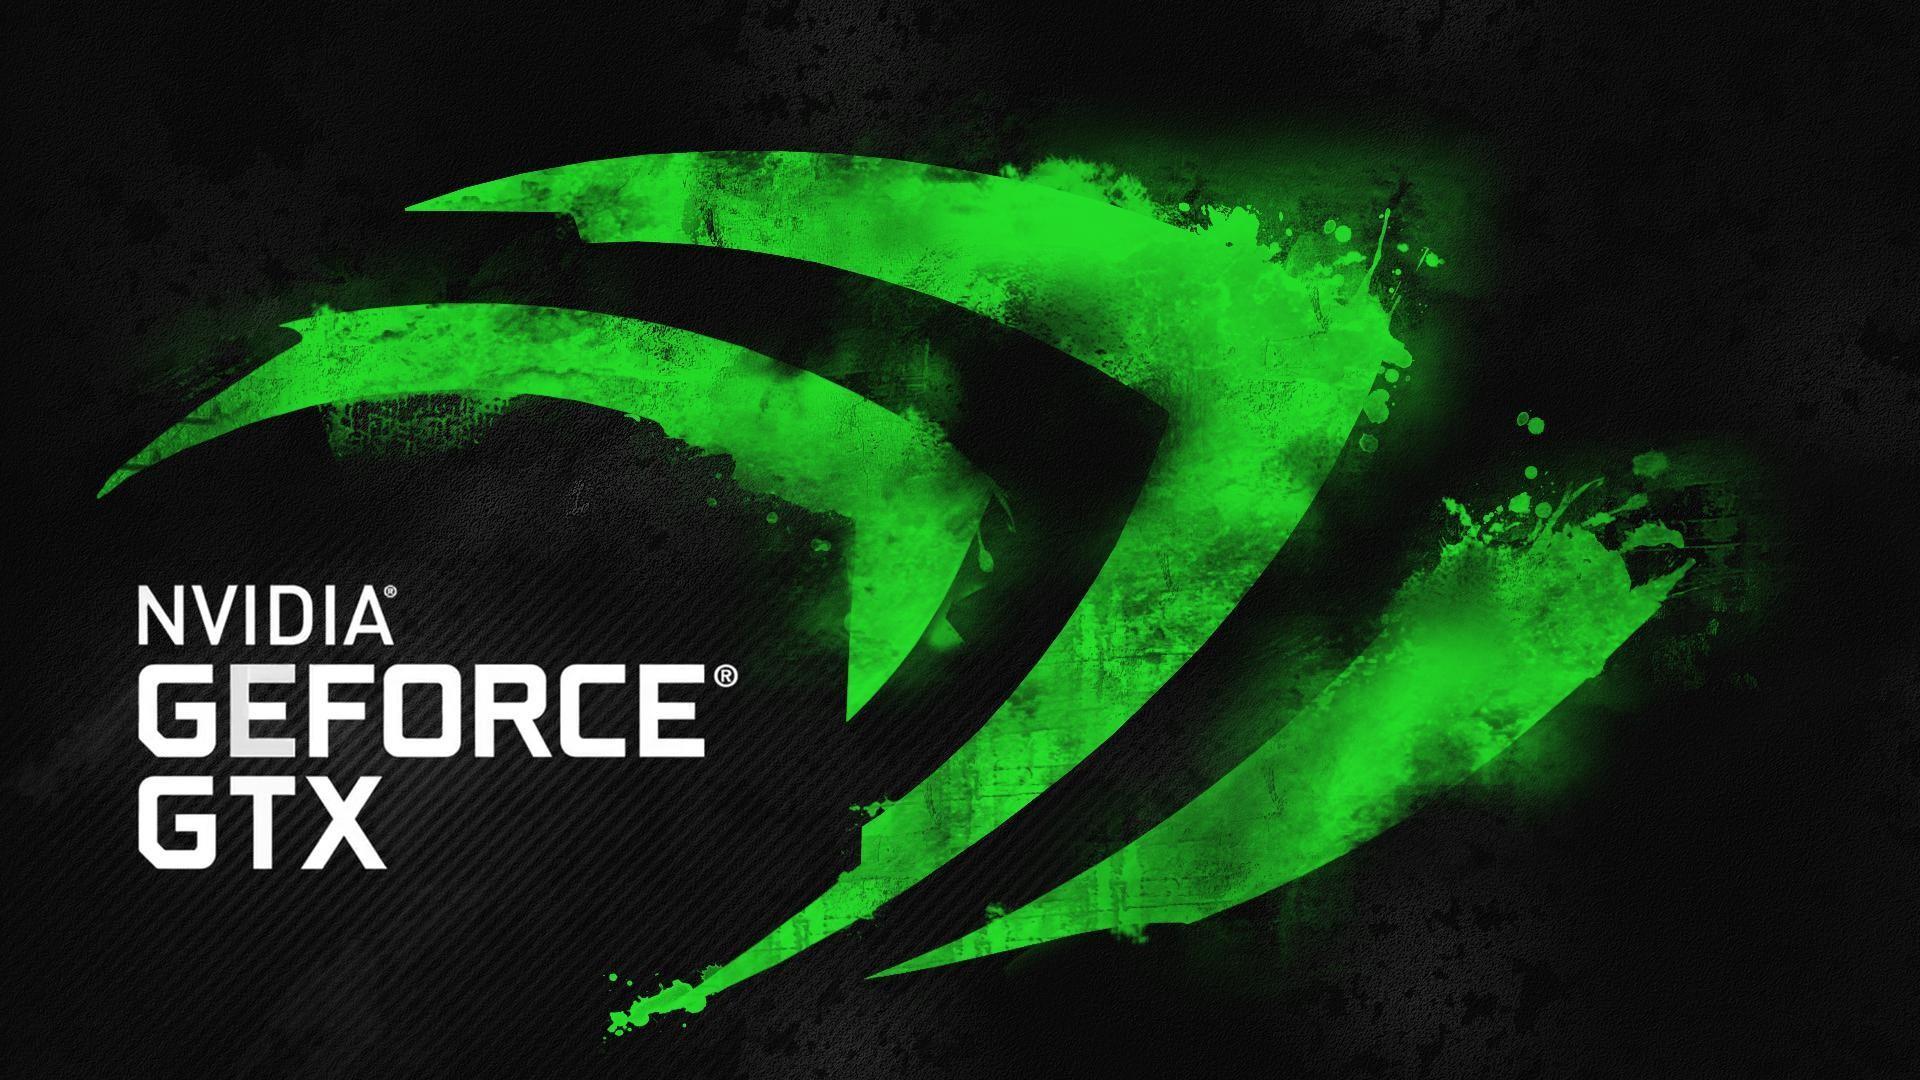 Nvidia Geforce GTX Grunge HD Wallpaper Download Wallpaper from .